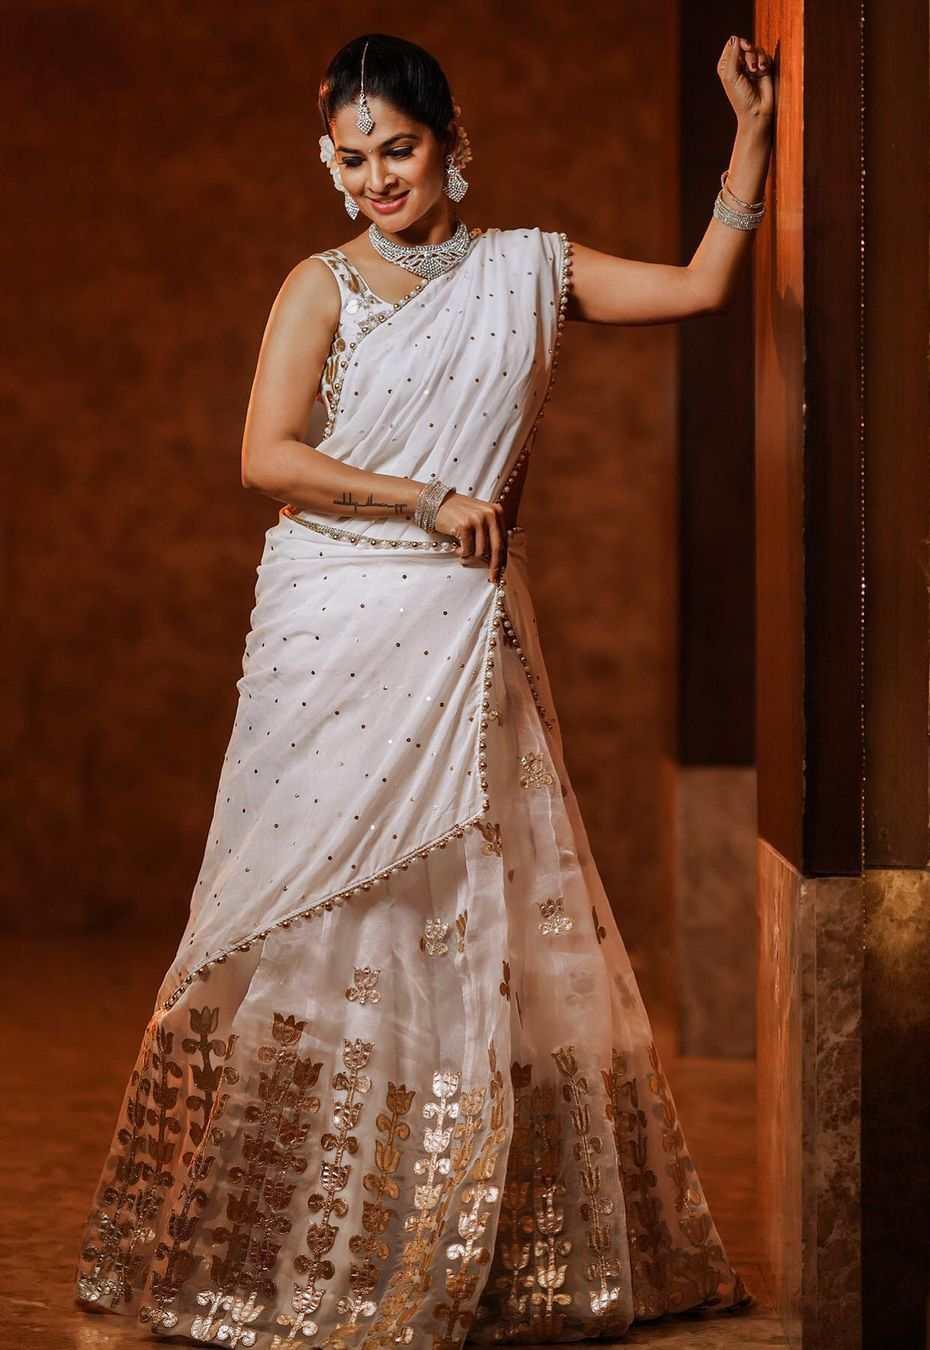 madhumita siva balaji in white gold half saree